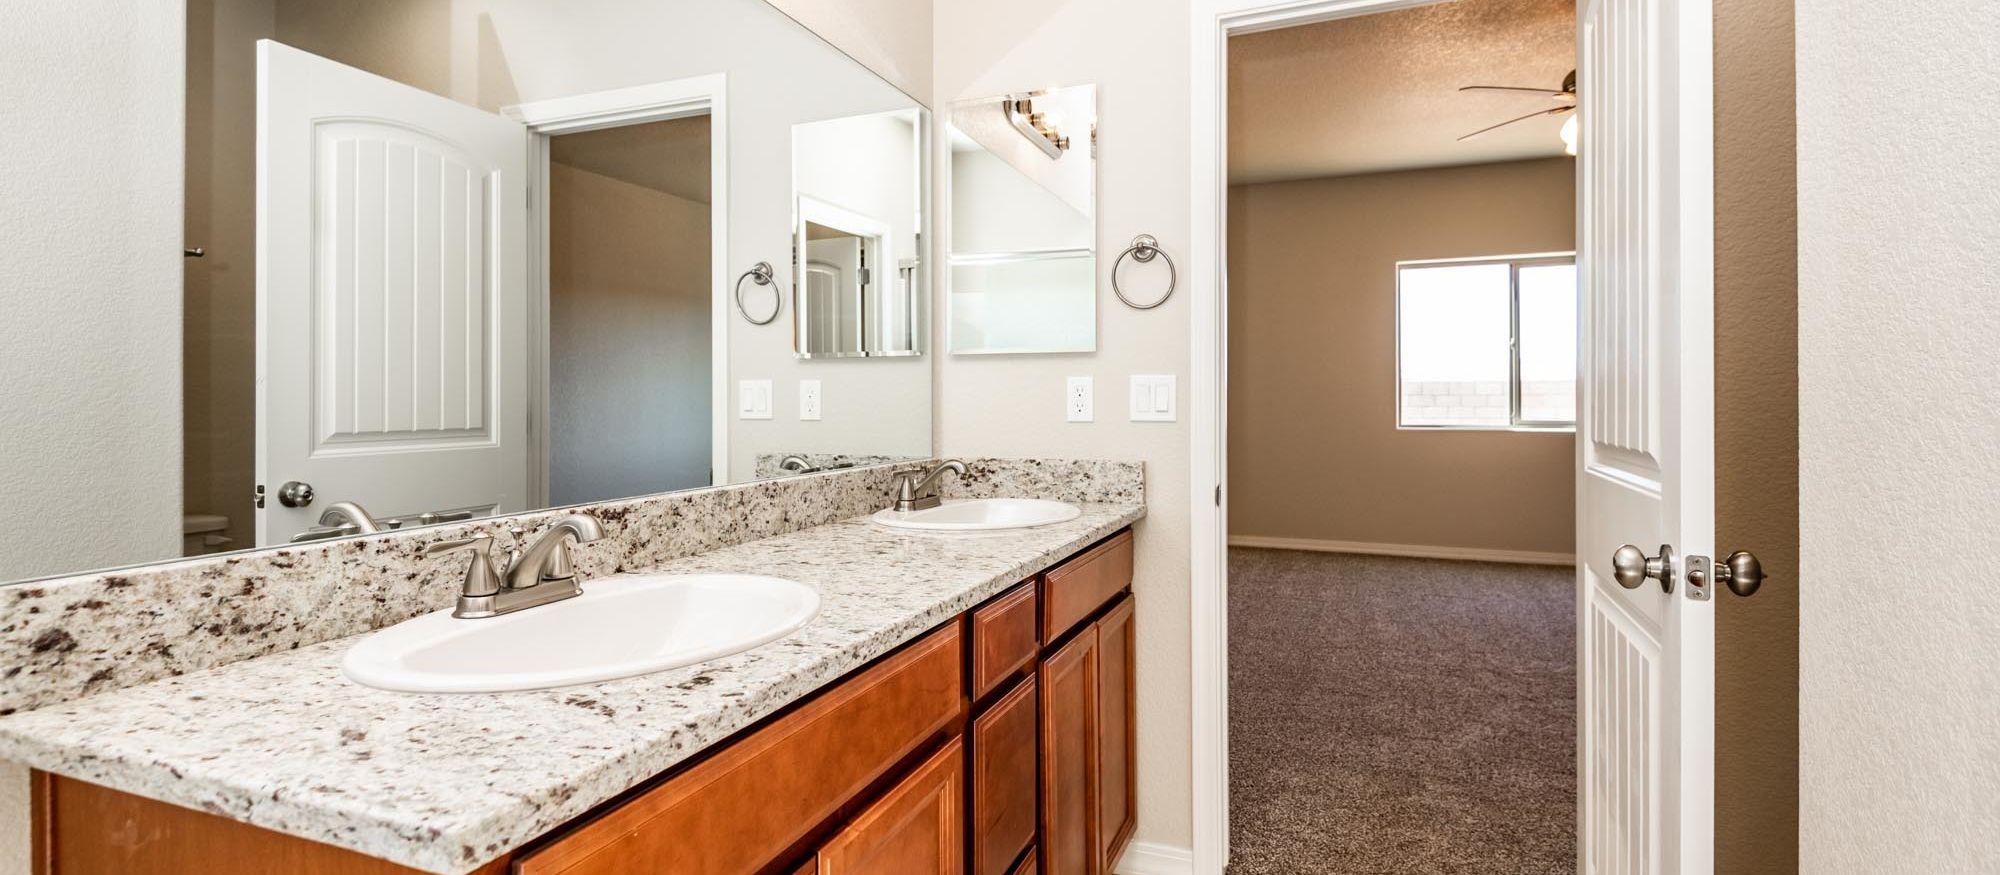 Bathroom featured in the Desert Rose 1472 2 Car By Angle Homes in Kingman-Lake Havasu City, AZ